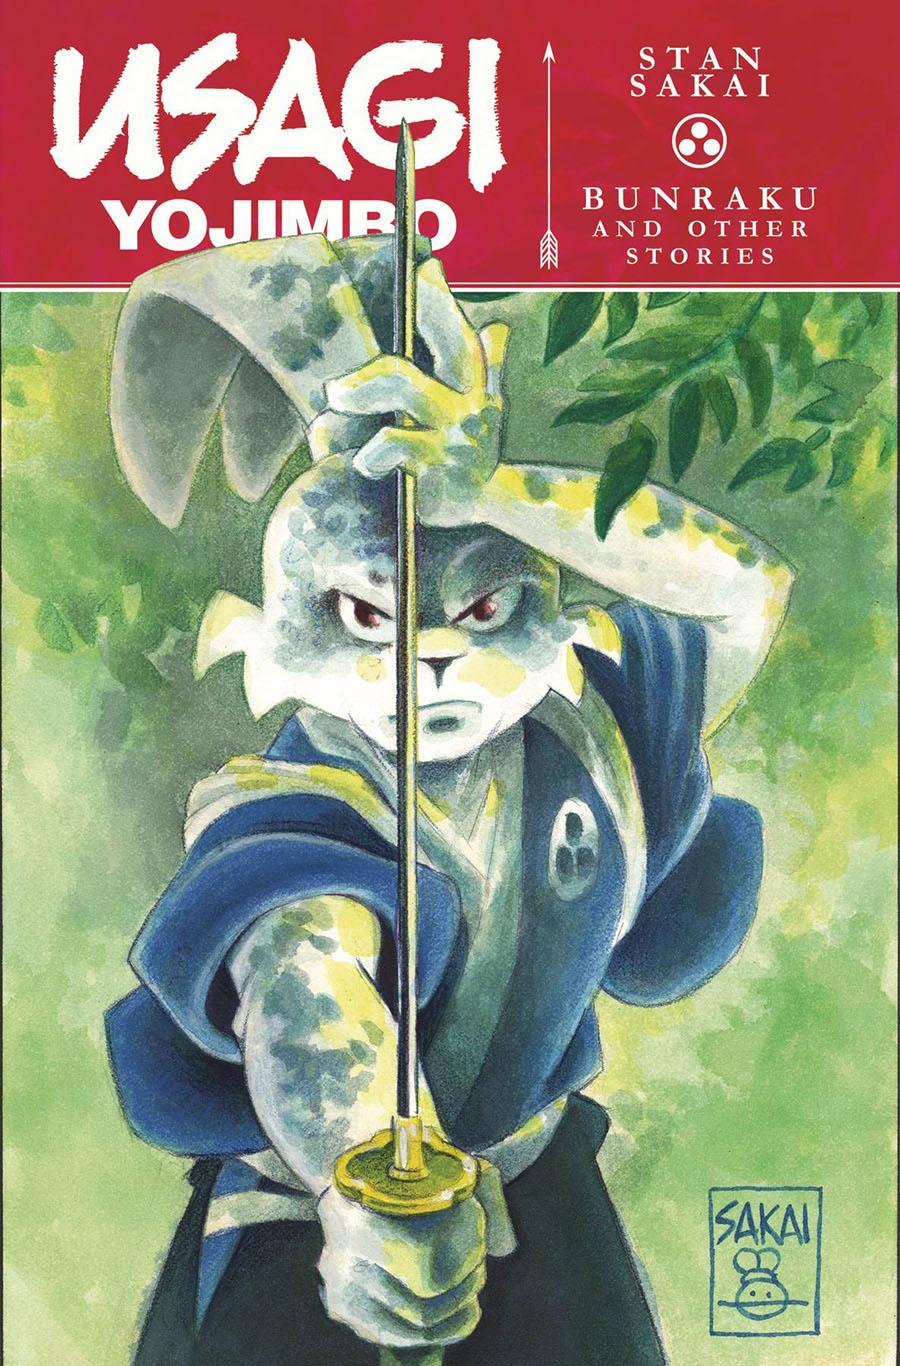 Usagi Yojimbo (IDW) Vol 1 Bunraku And Other Stories TP